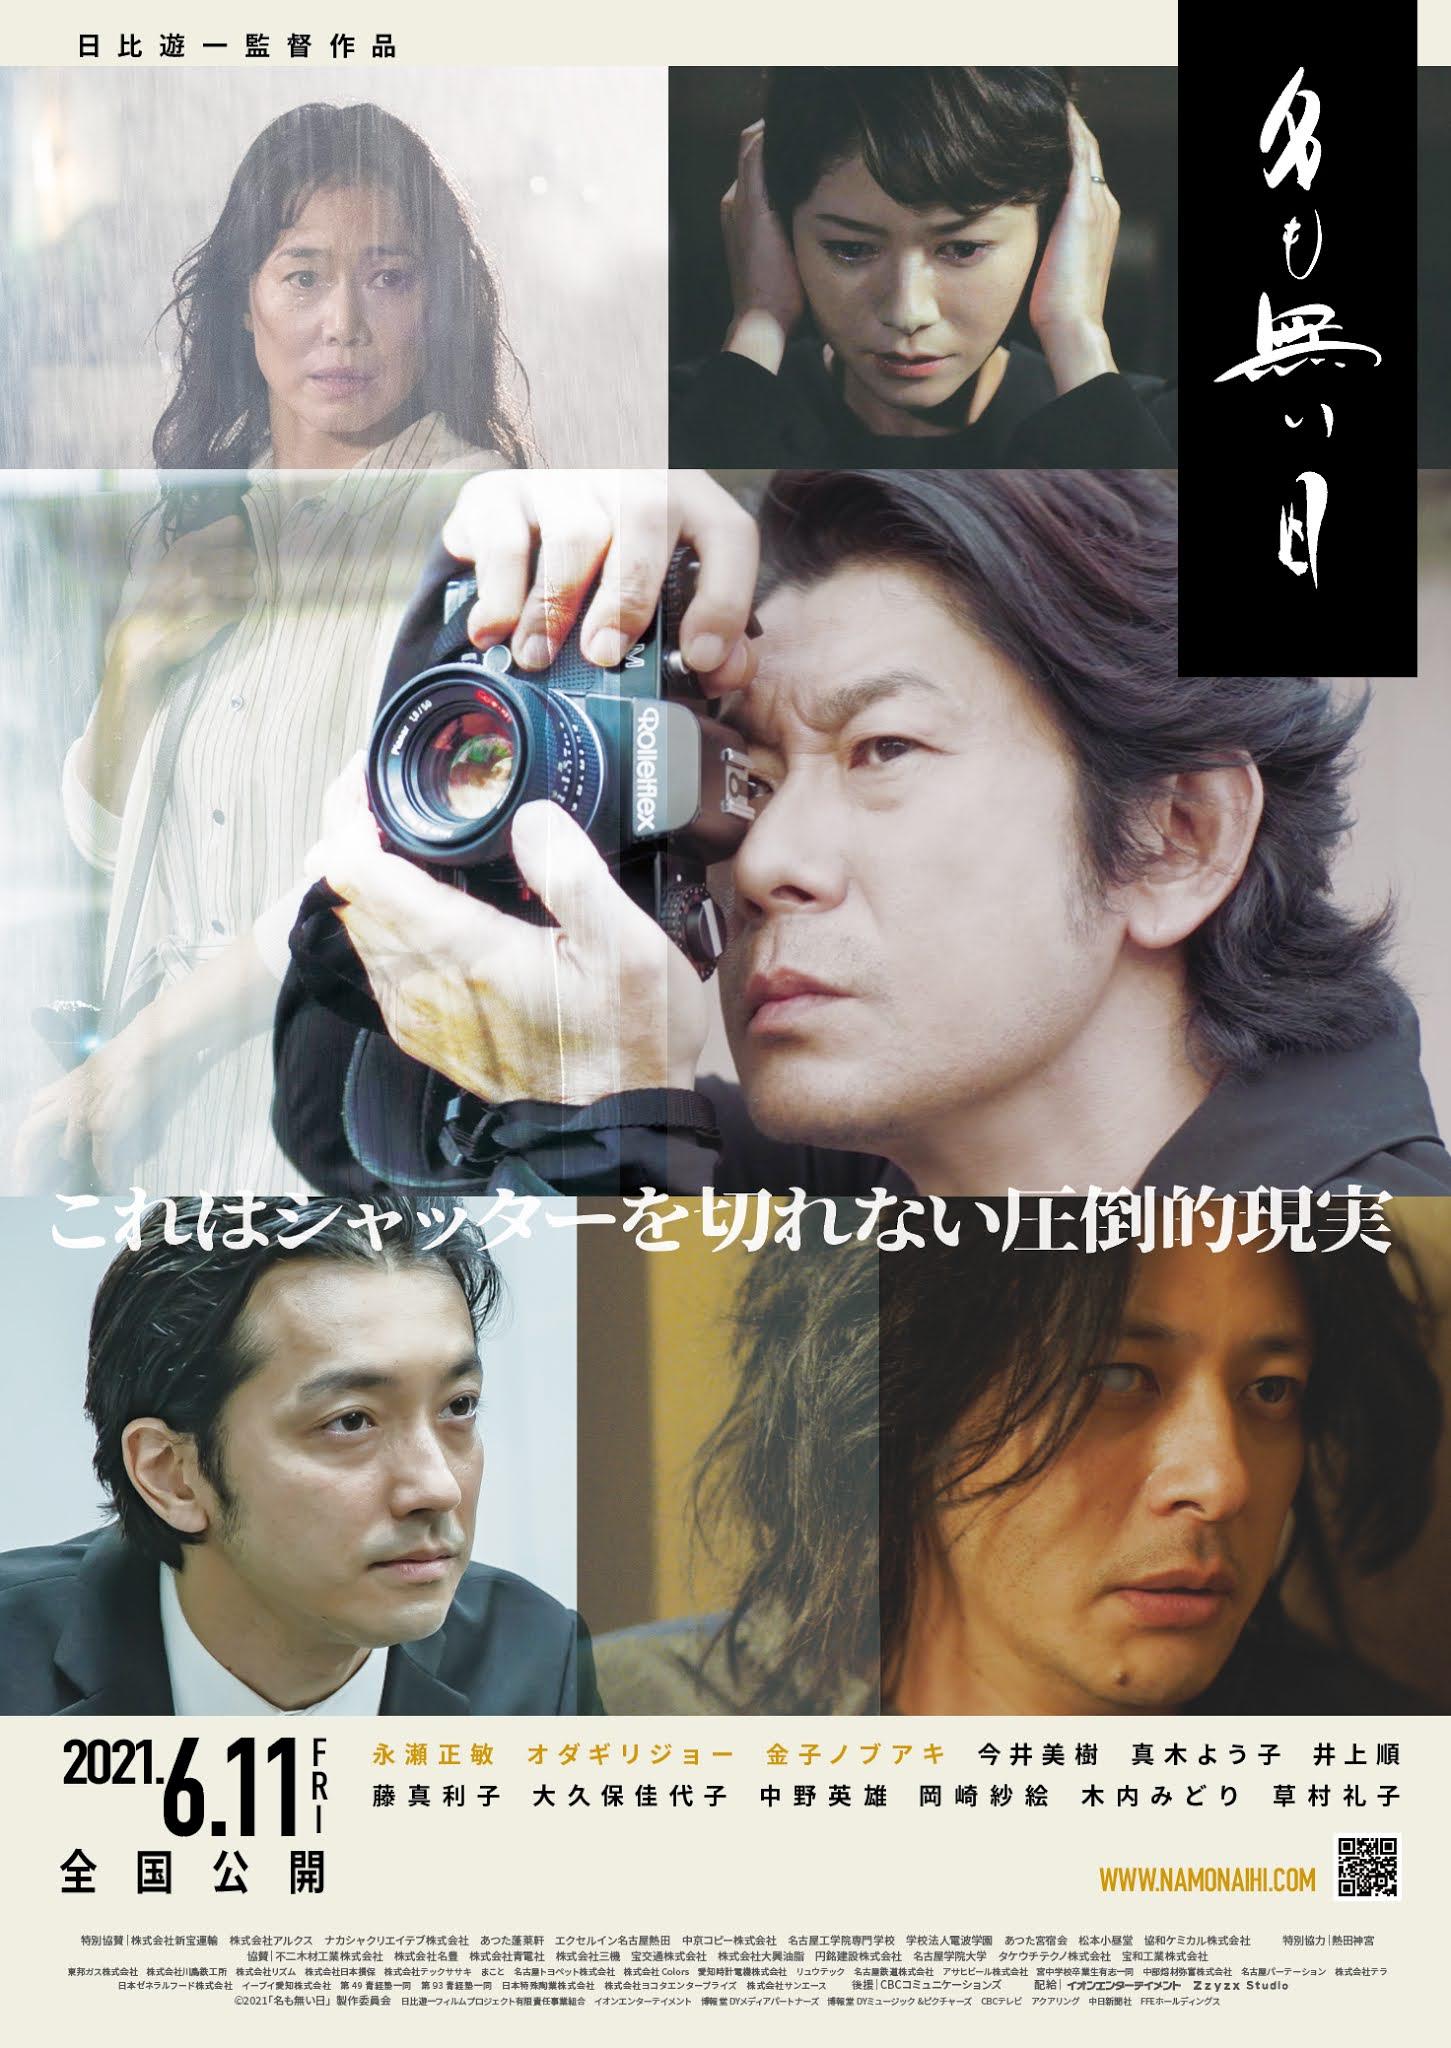 Namonaihi: A Day With No Name film - Yuichi Hibi - poster